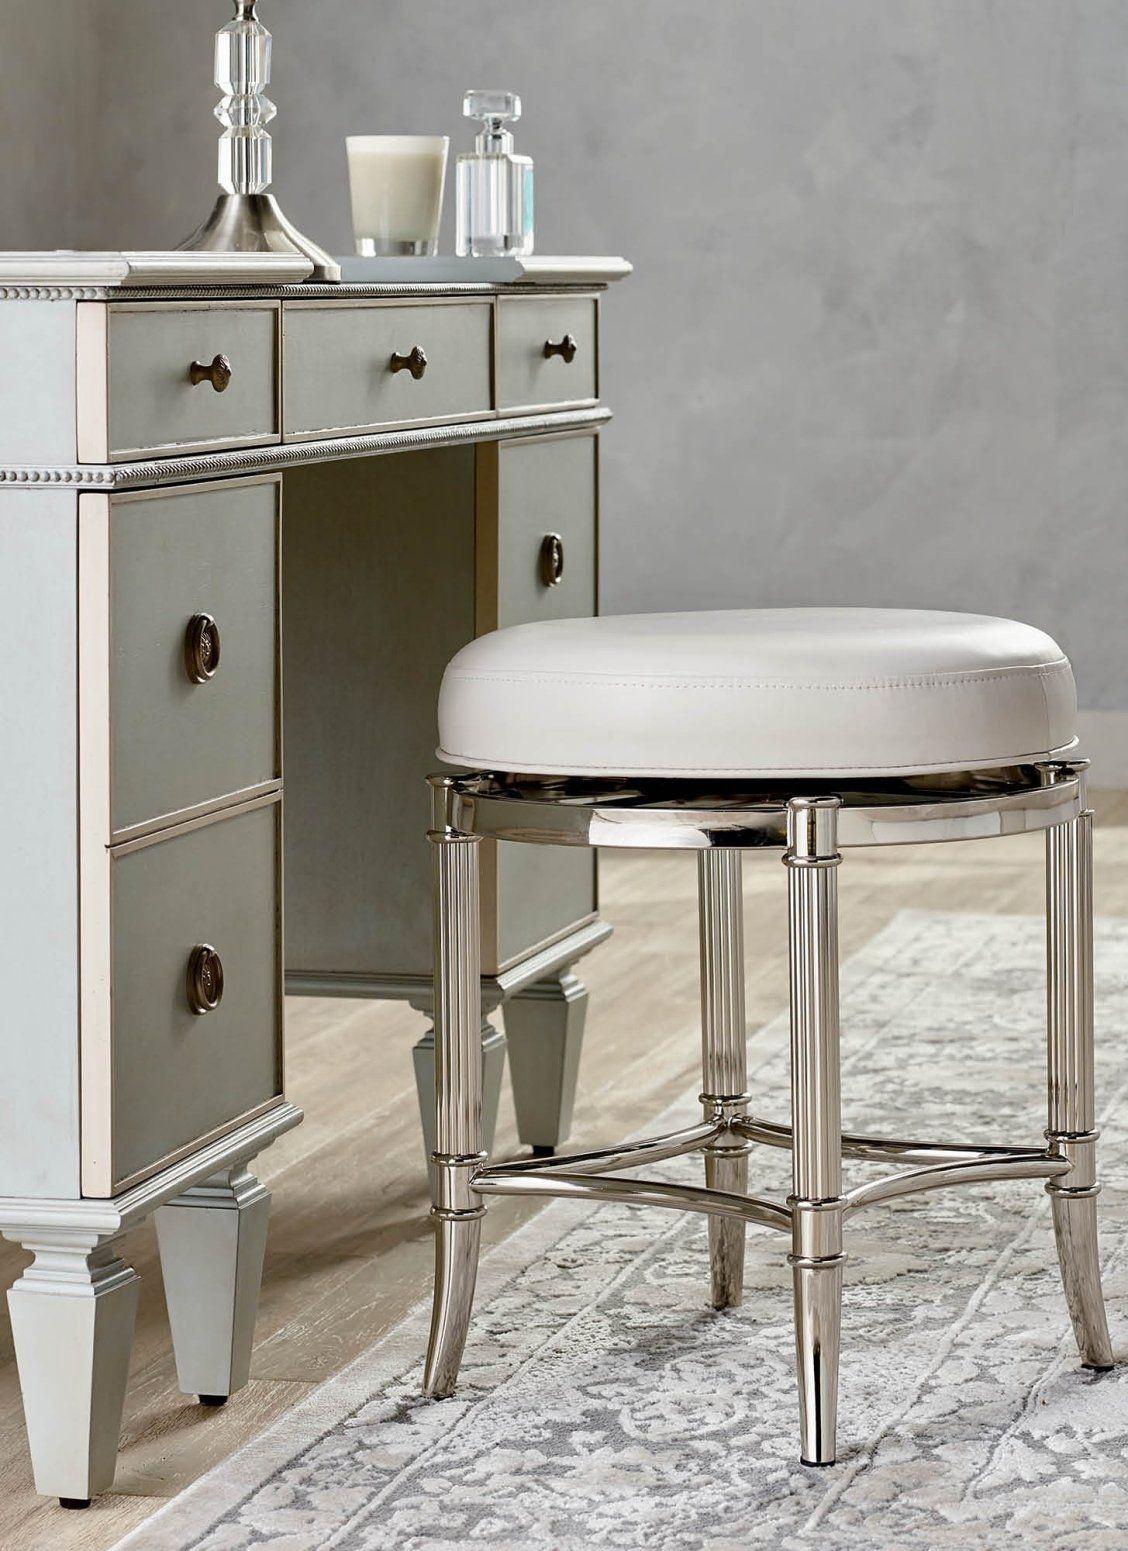 Bailey swivel vanity stool frontgate vanity stool